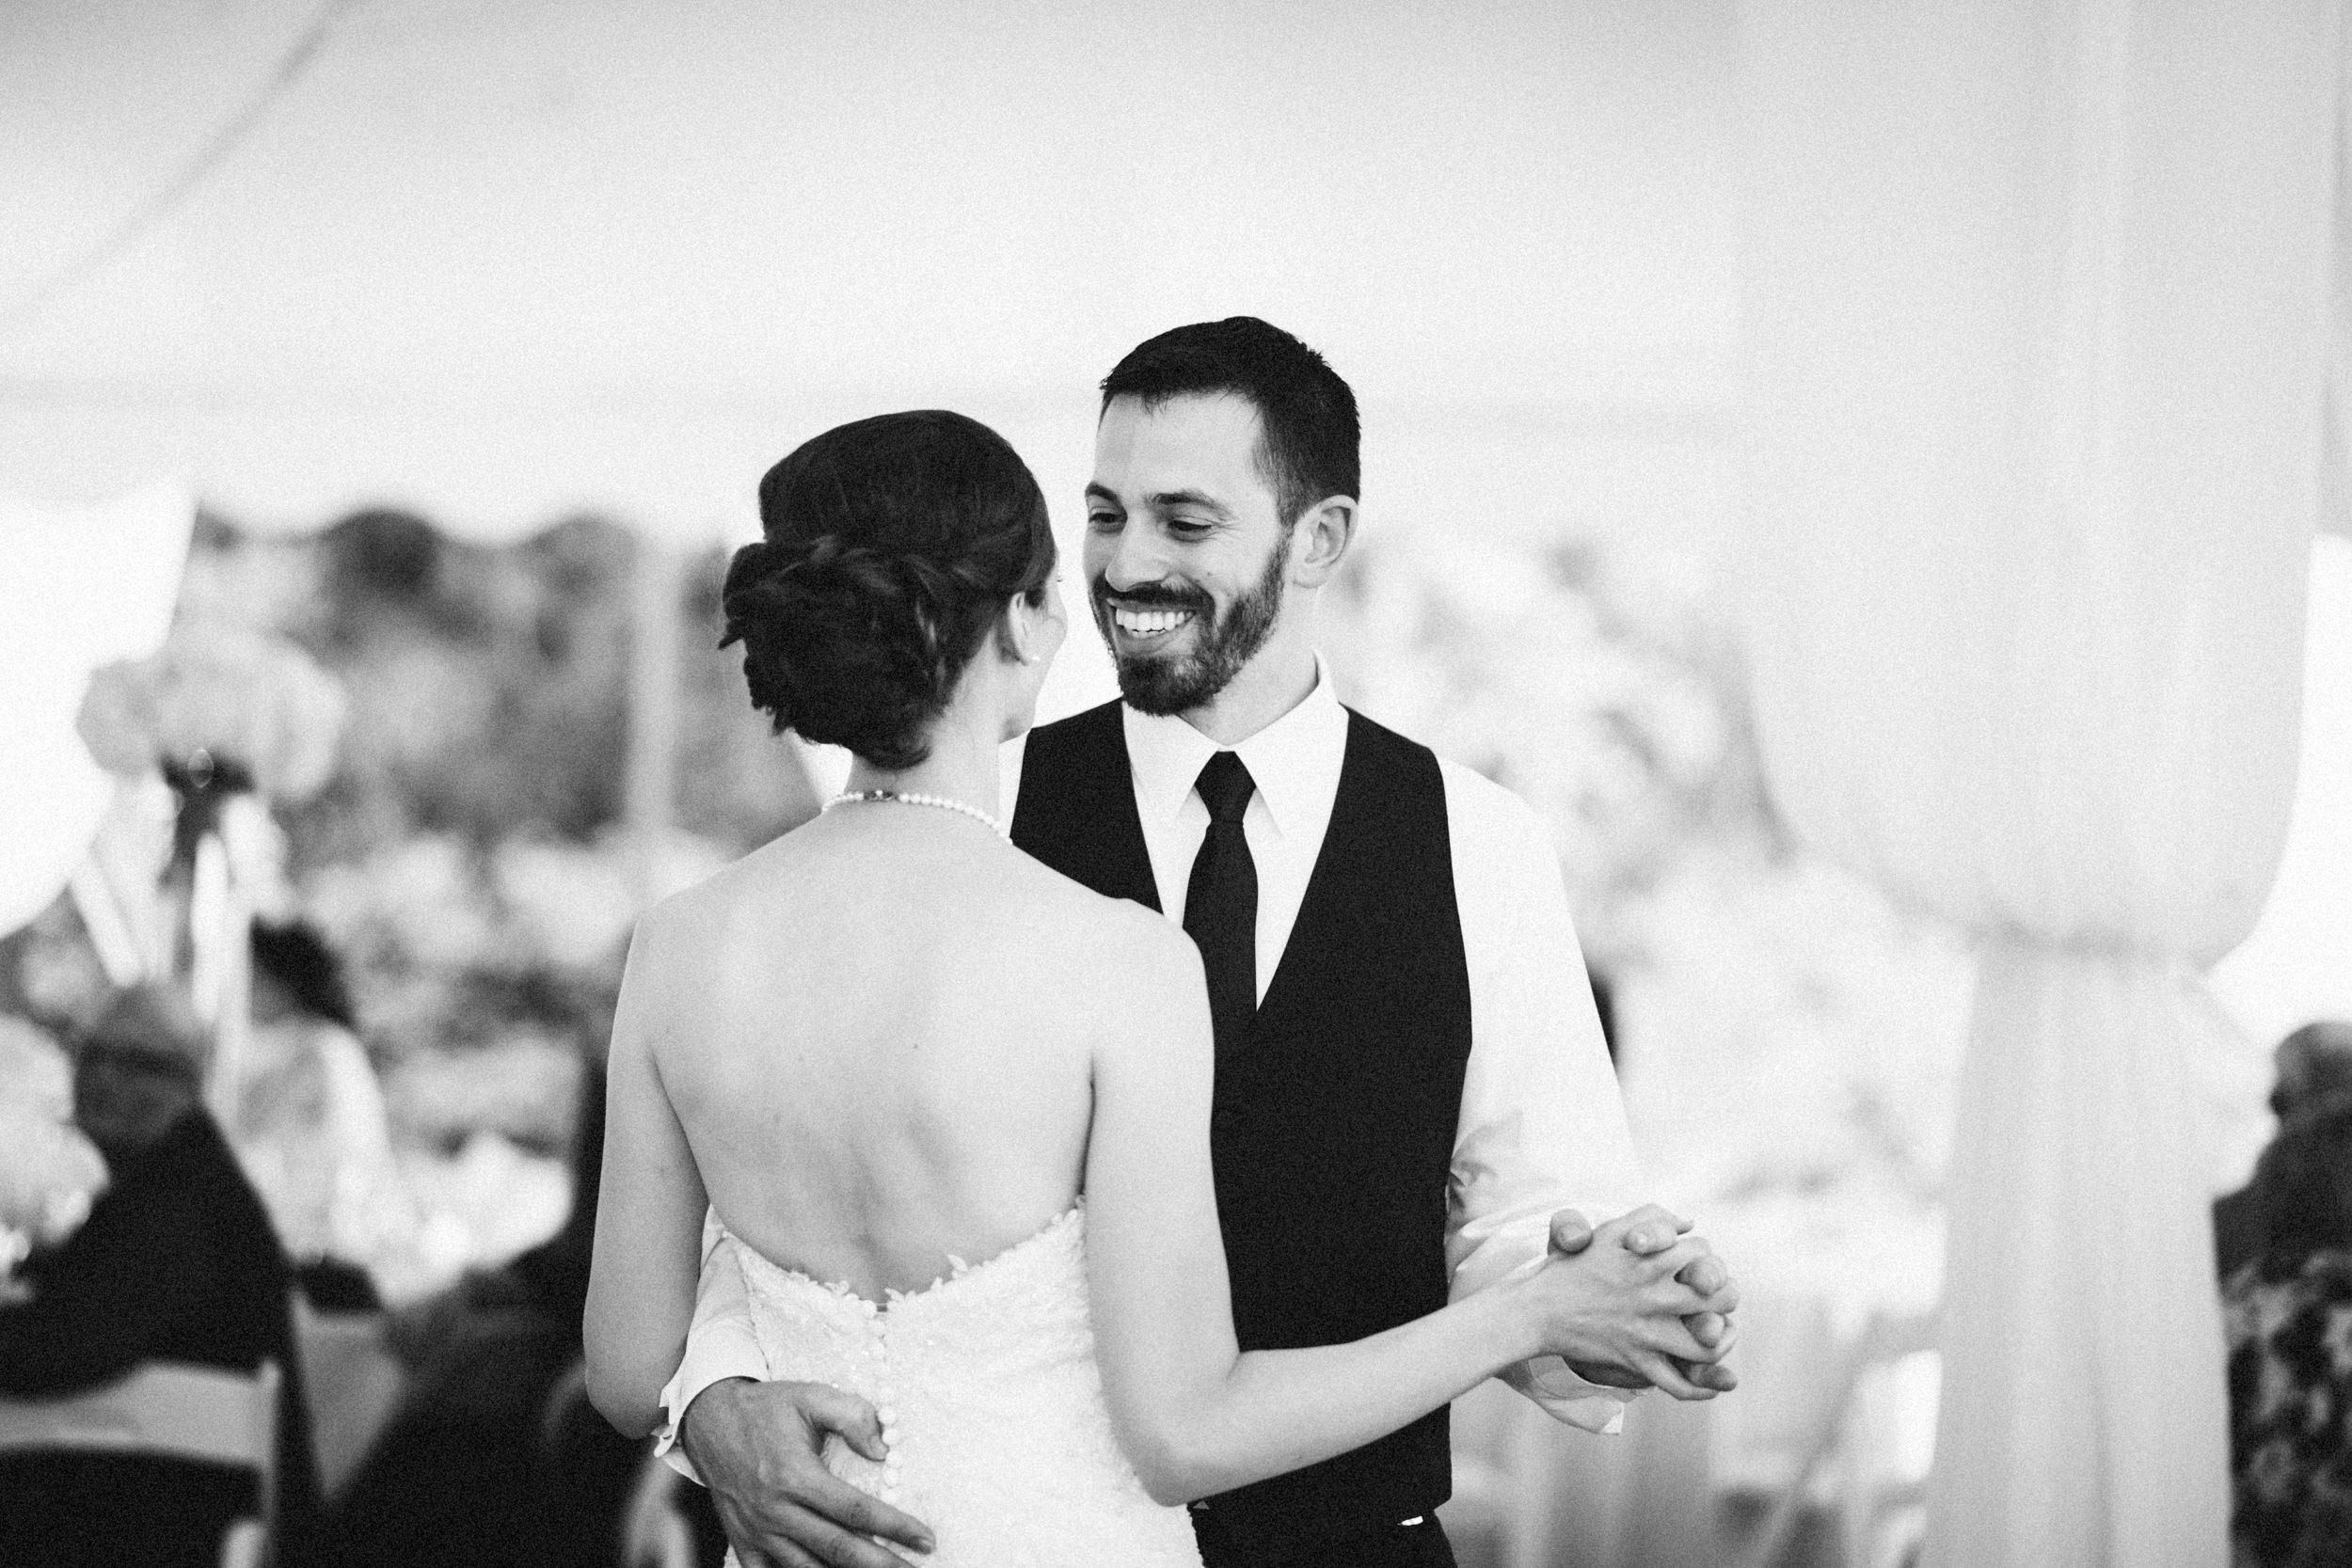 Louisville-Kentucky-Wedding-Elopement-Photographer-Sarah-Katherine-Davis-Photography-Whitehall-Classic-Timeless-Garden-Wedding-667.jpg